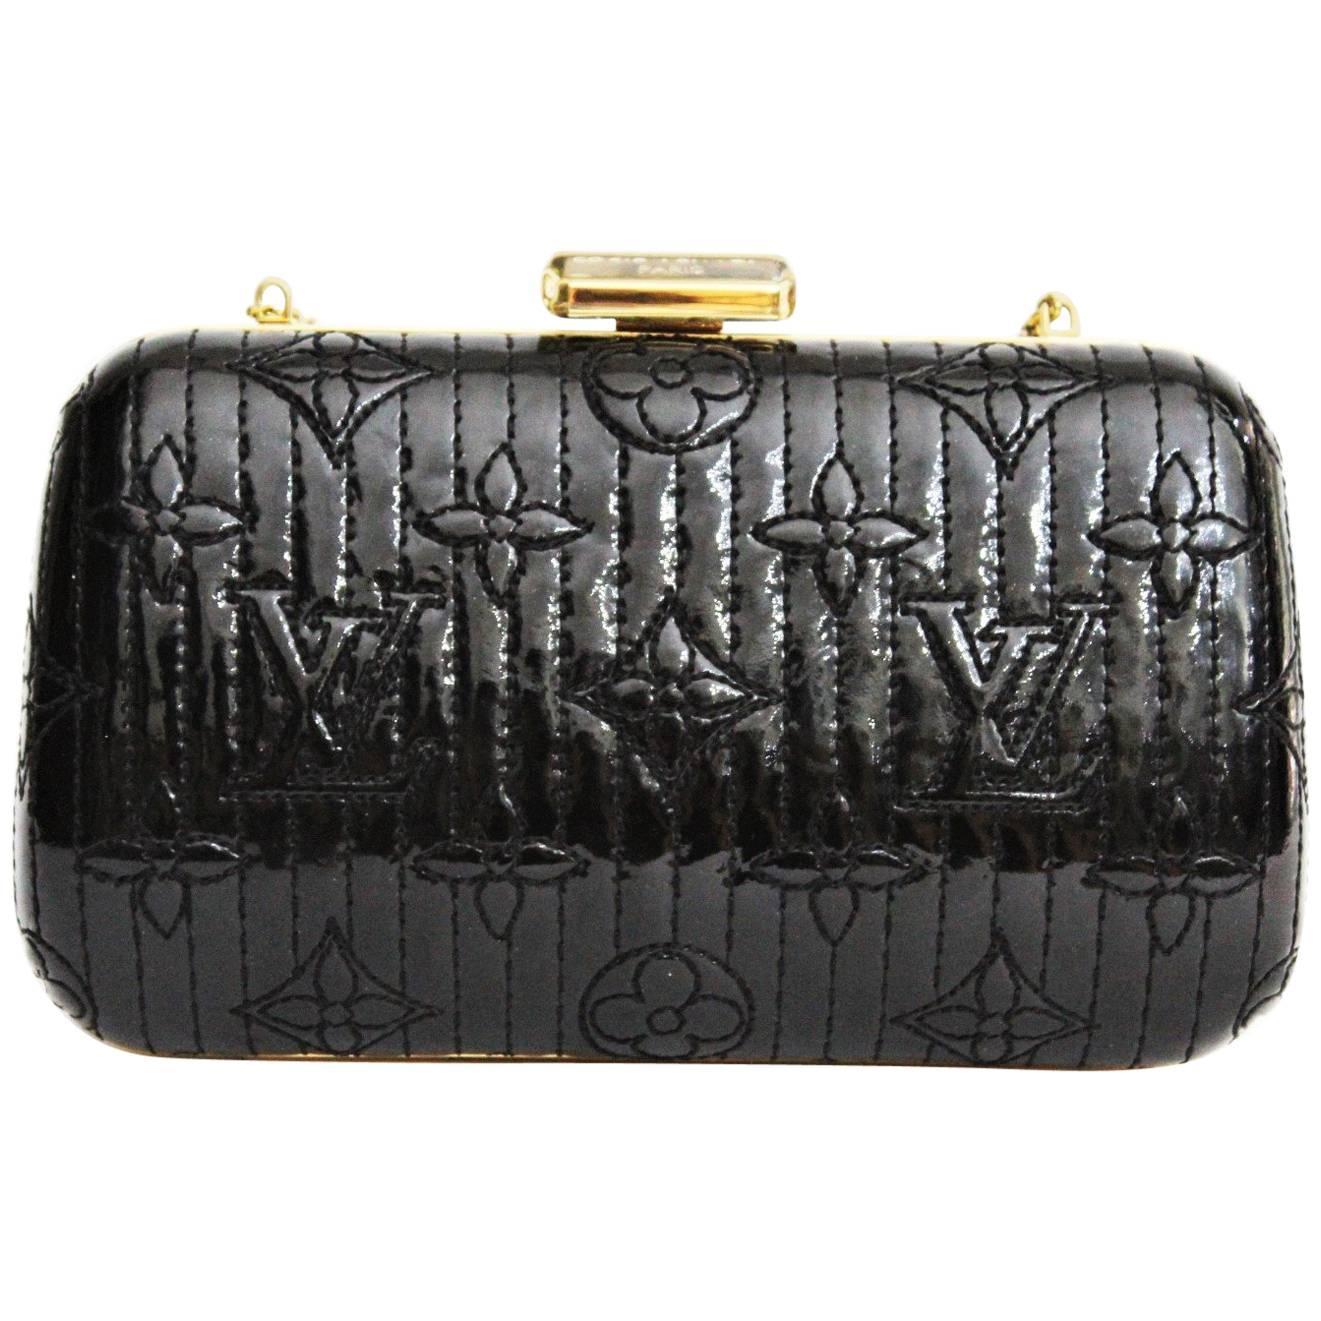 LOUIS VUITTON Limited Edition Black Vernis Monogram Minaudiere Motard Clutch Bag